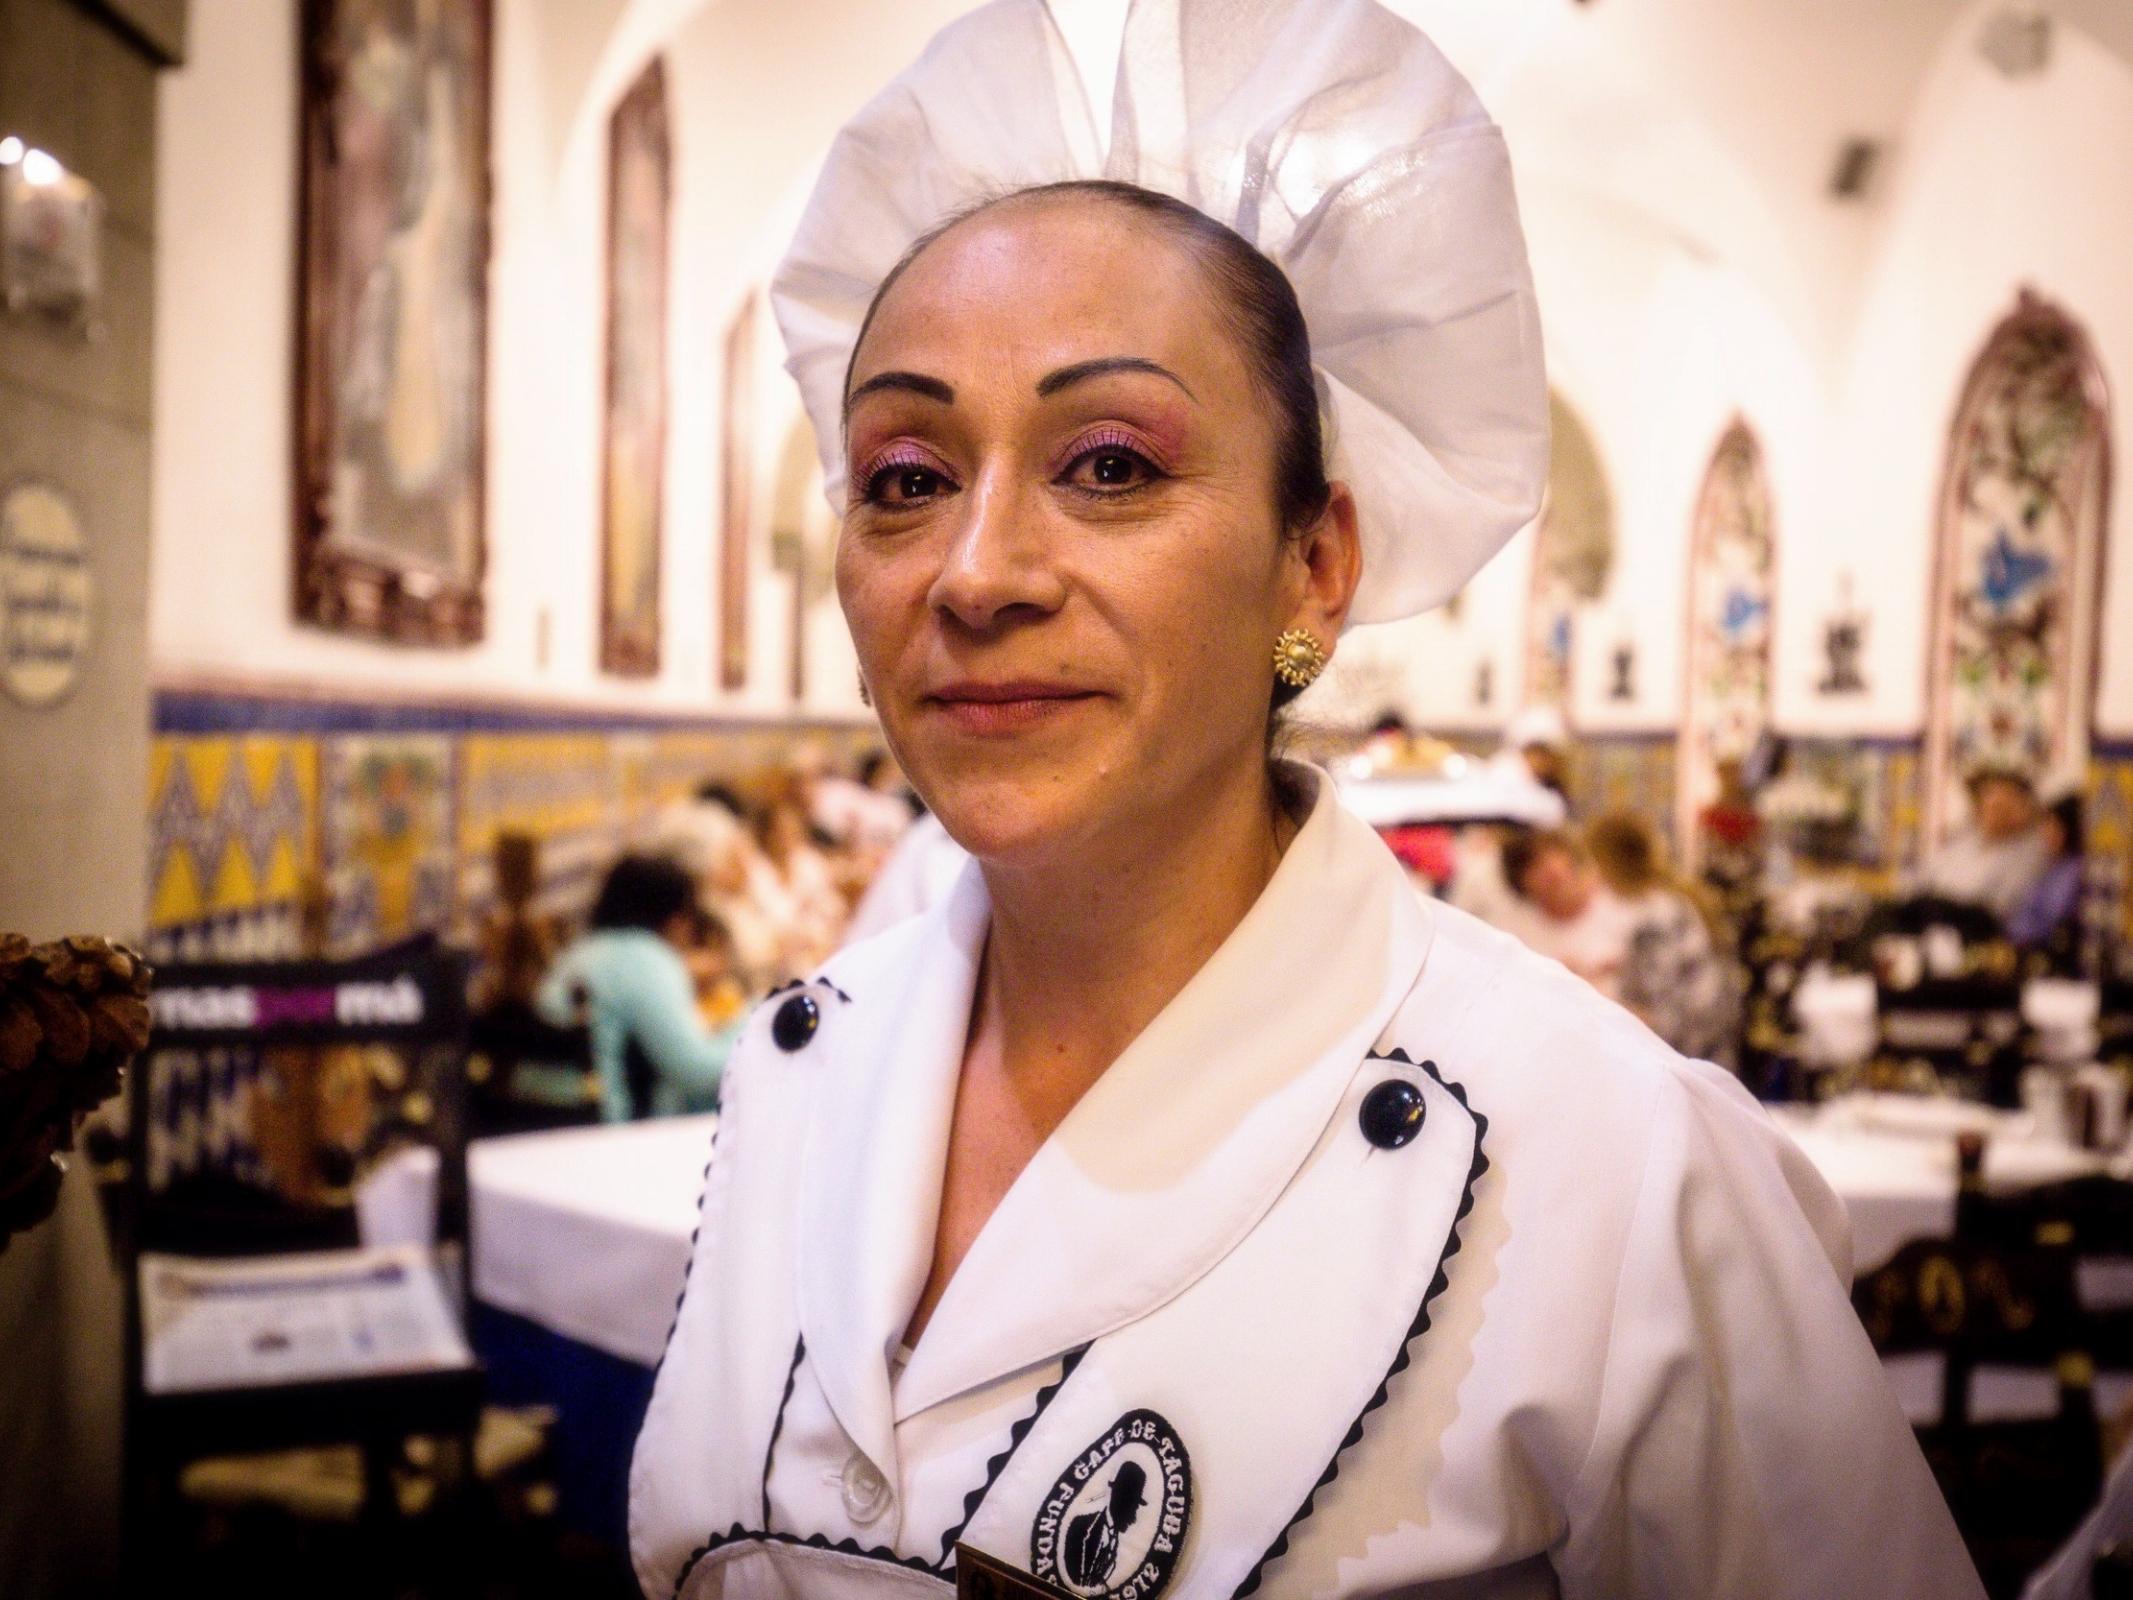 Waitress, Cafe de Tacuba, Mexico City